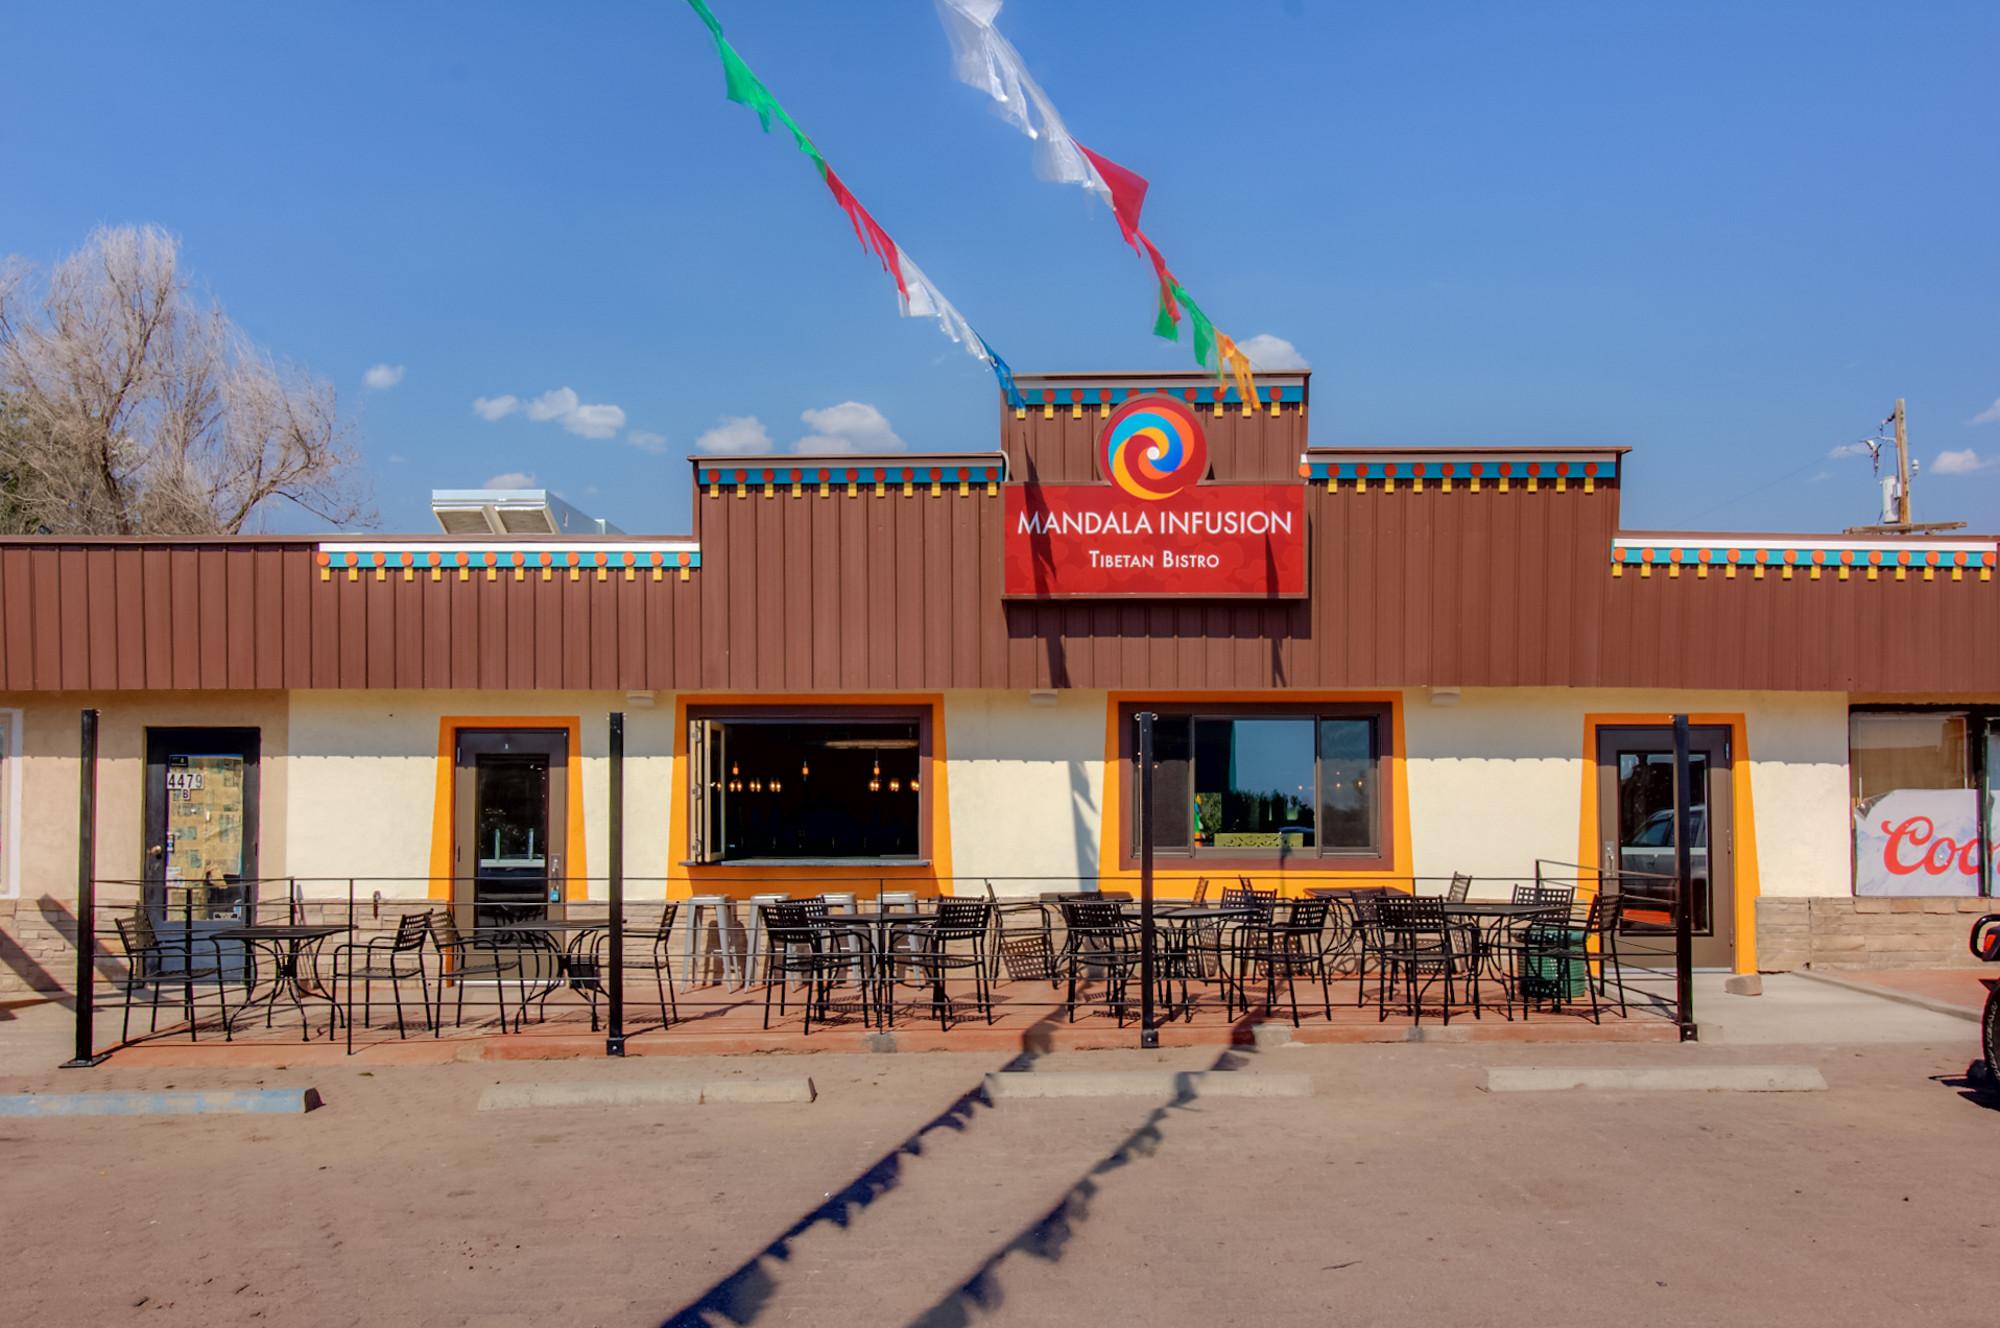 Mandala Infusion - Commercial/Restaurant